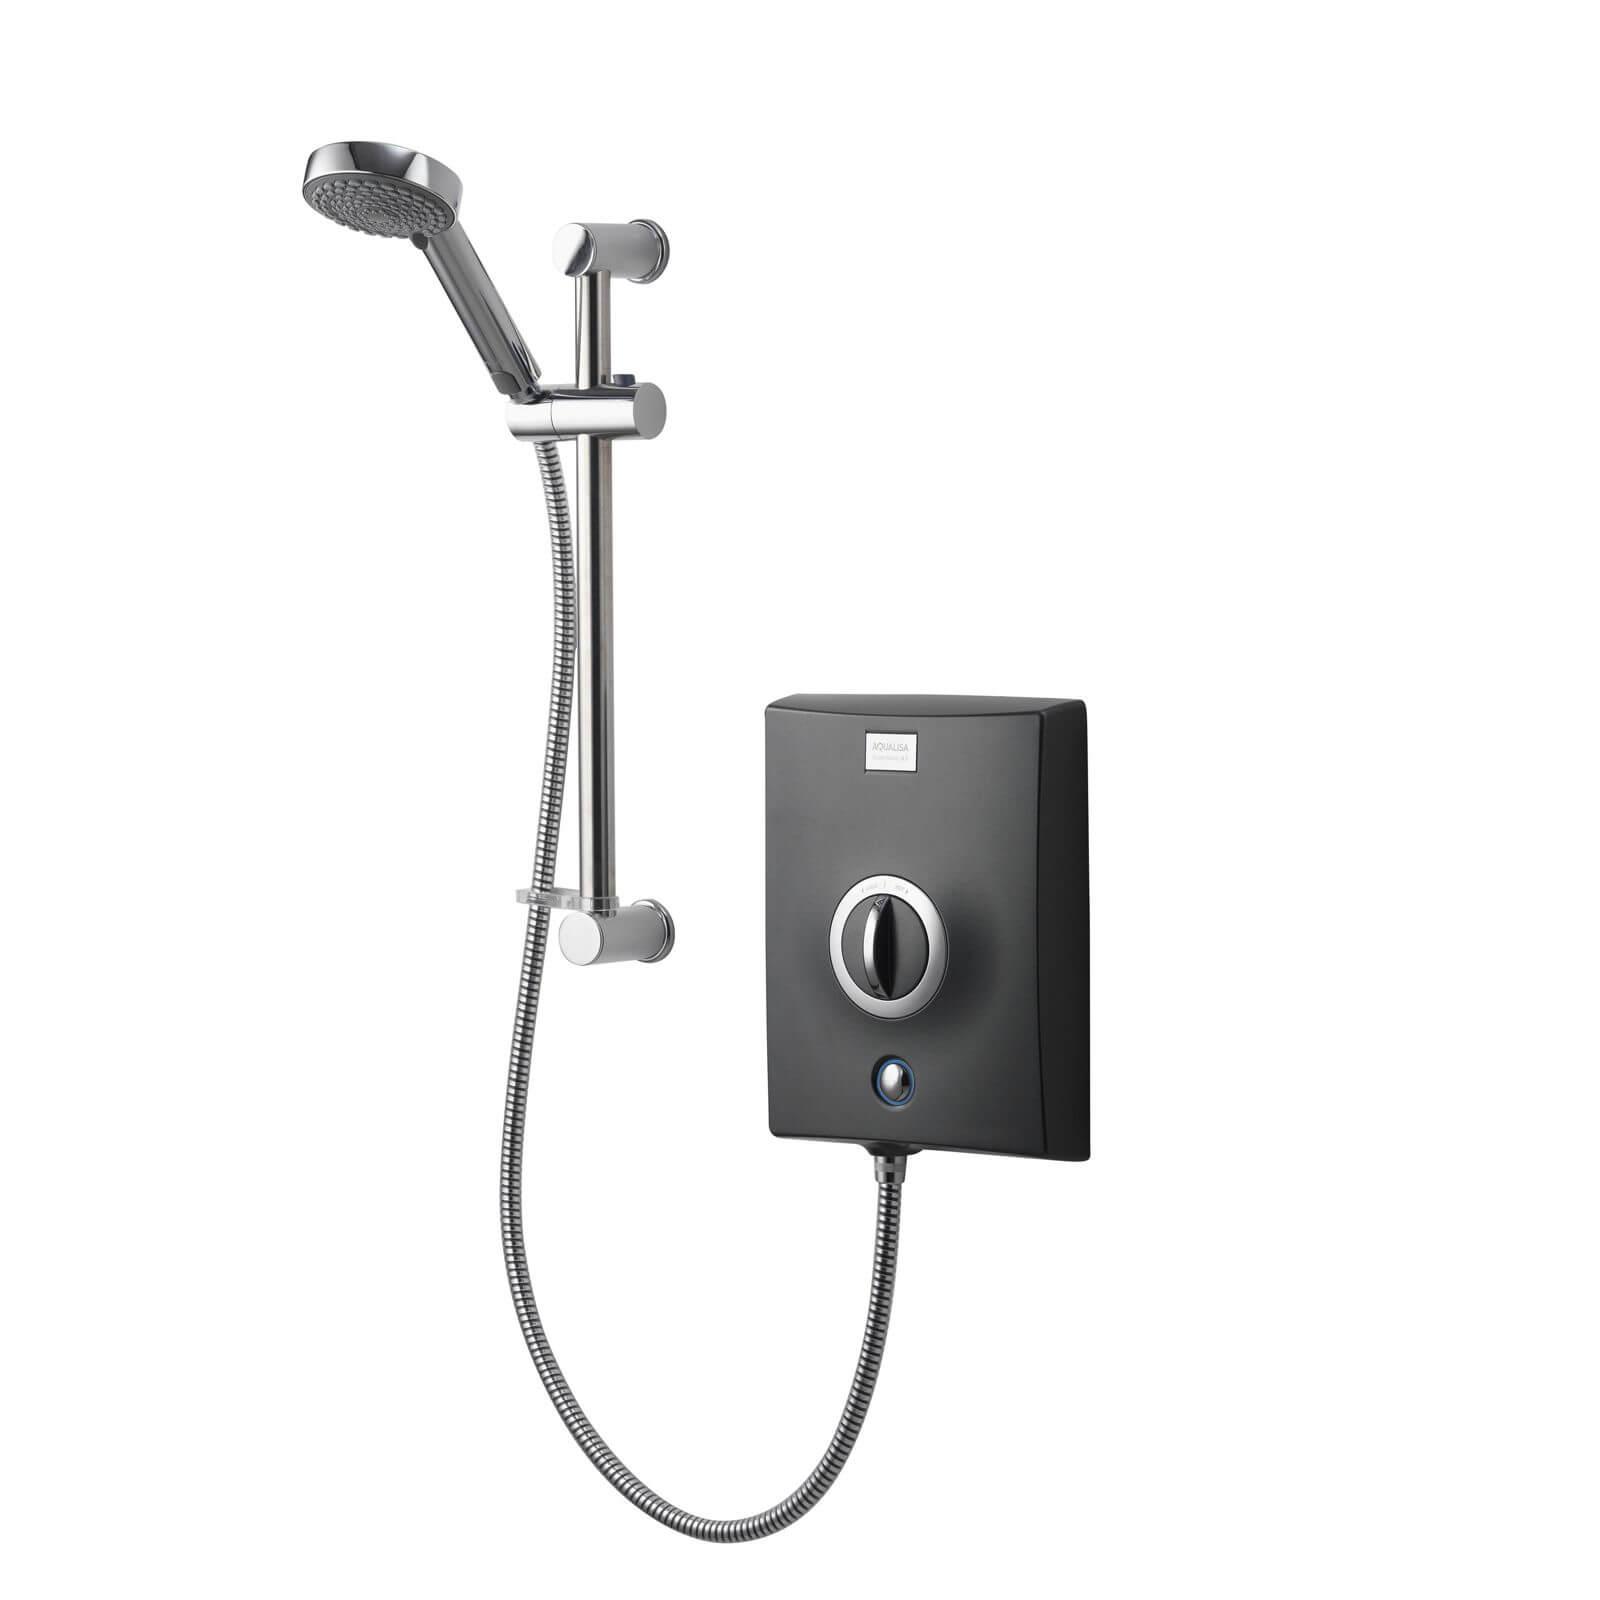 Aqualisa Quartz 8.5kW Electric Shower - Graphite/Chrome